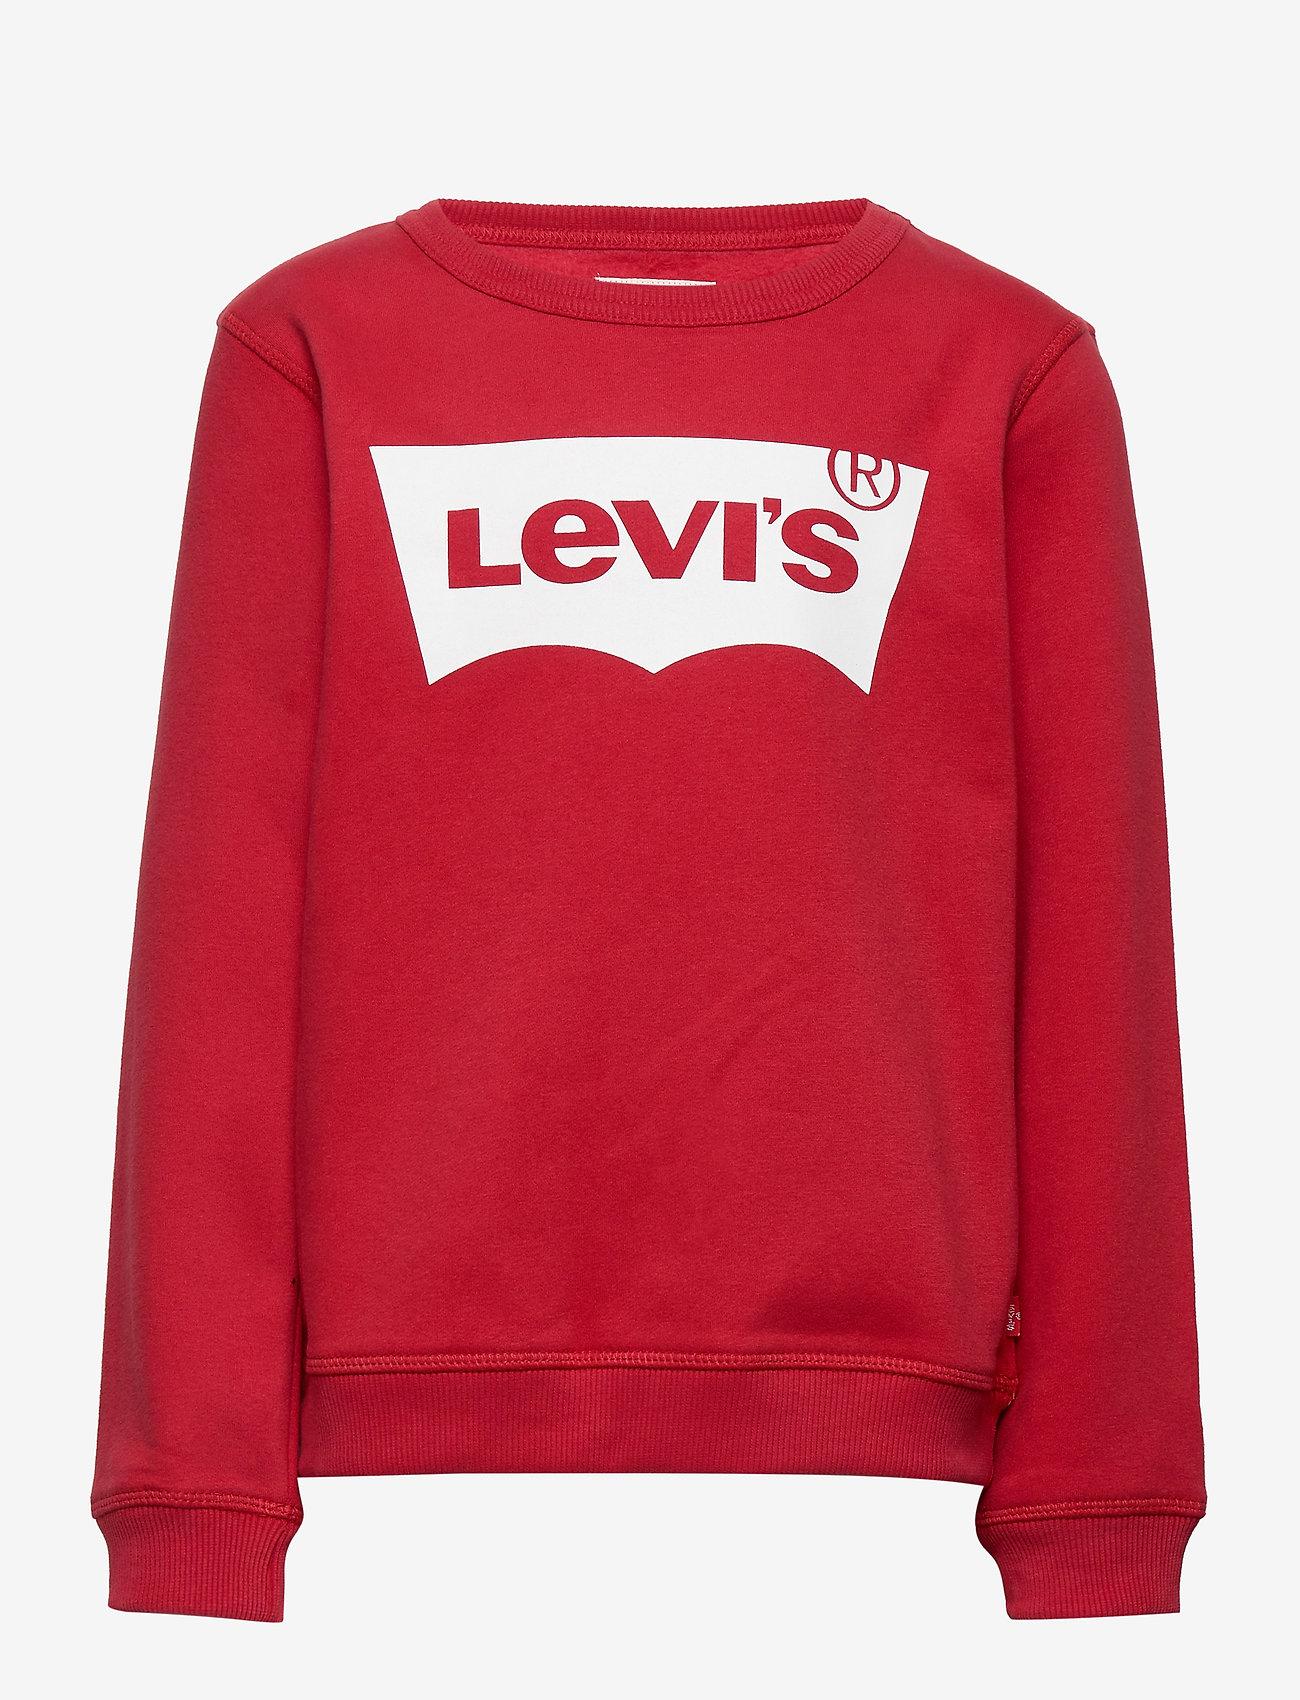 Levi's - SWEAT SHIRT - sweatshirts - levi's red/white - 0